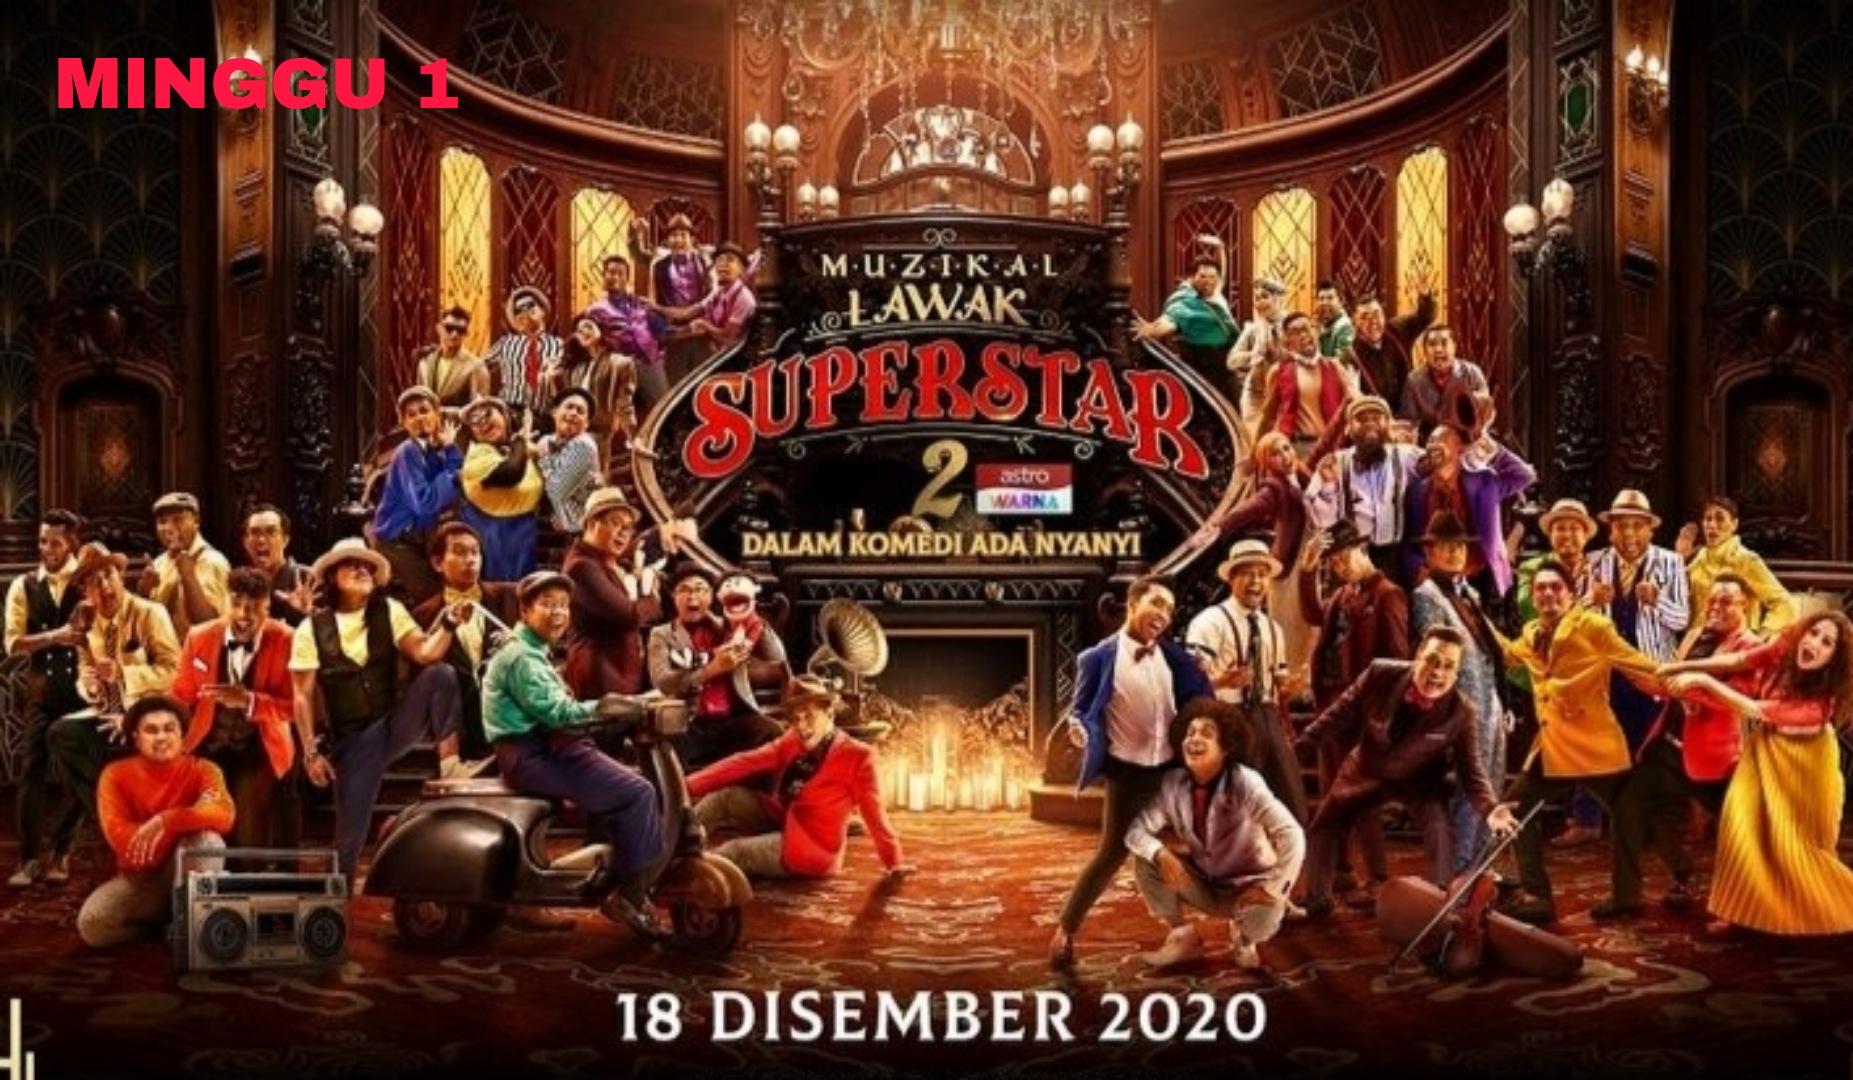 Live Streaming Muzikal Lawak Superstar 2020 Minggu 1 (Online)